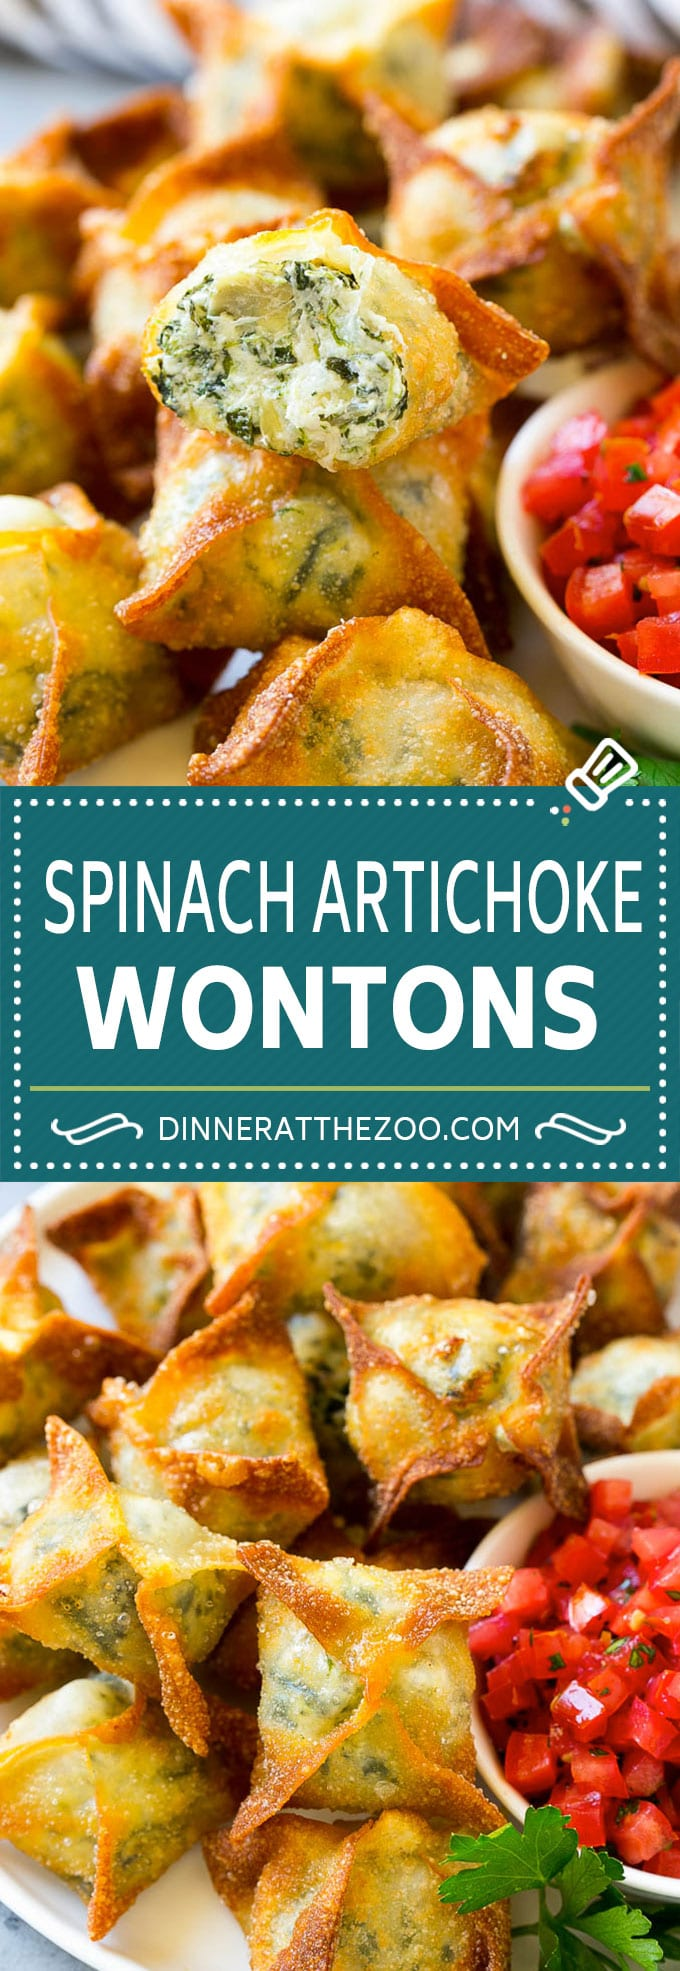 Spinach Artichoke Wontons Recipe | Fried Wontons | Wonton Appetizer #wontons #appetizer #snack #artichoke #spinach #dinneratthezoo